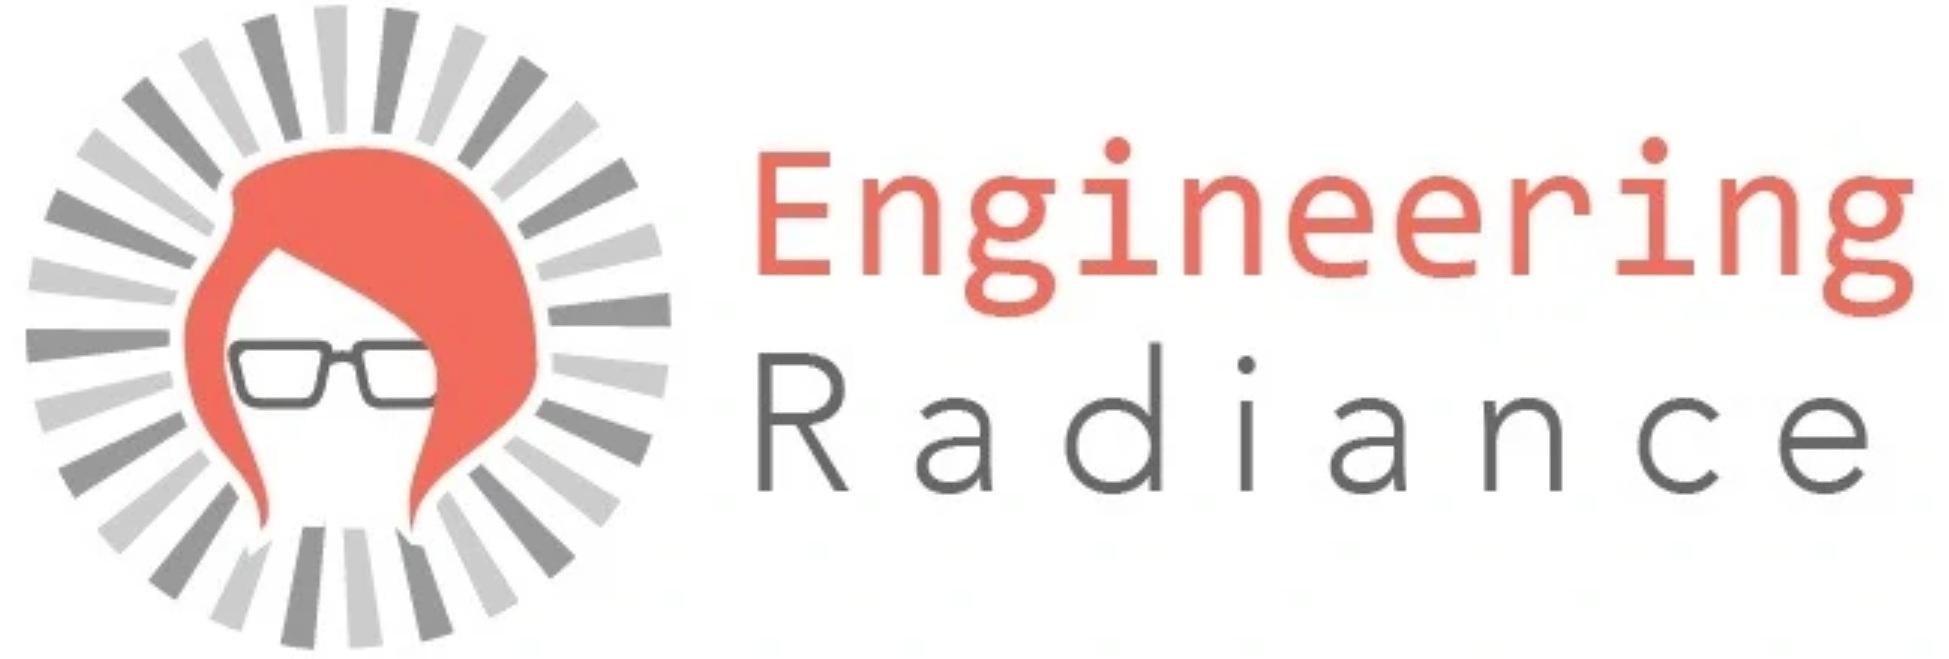 Nickie Lane Marketing Client Engineering Radiance